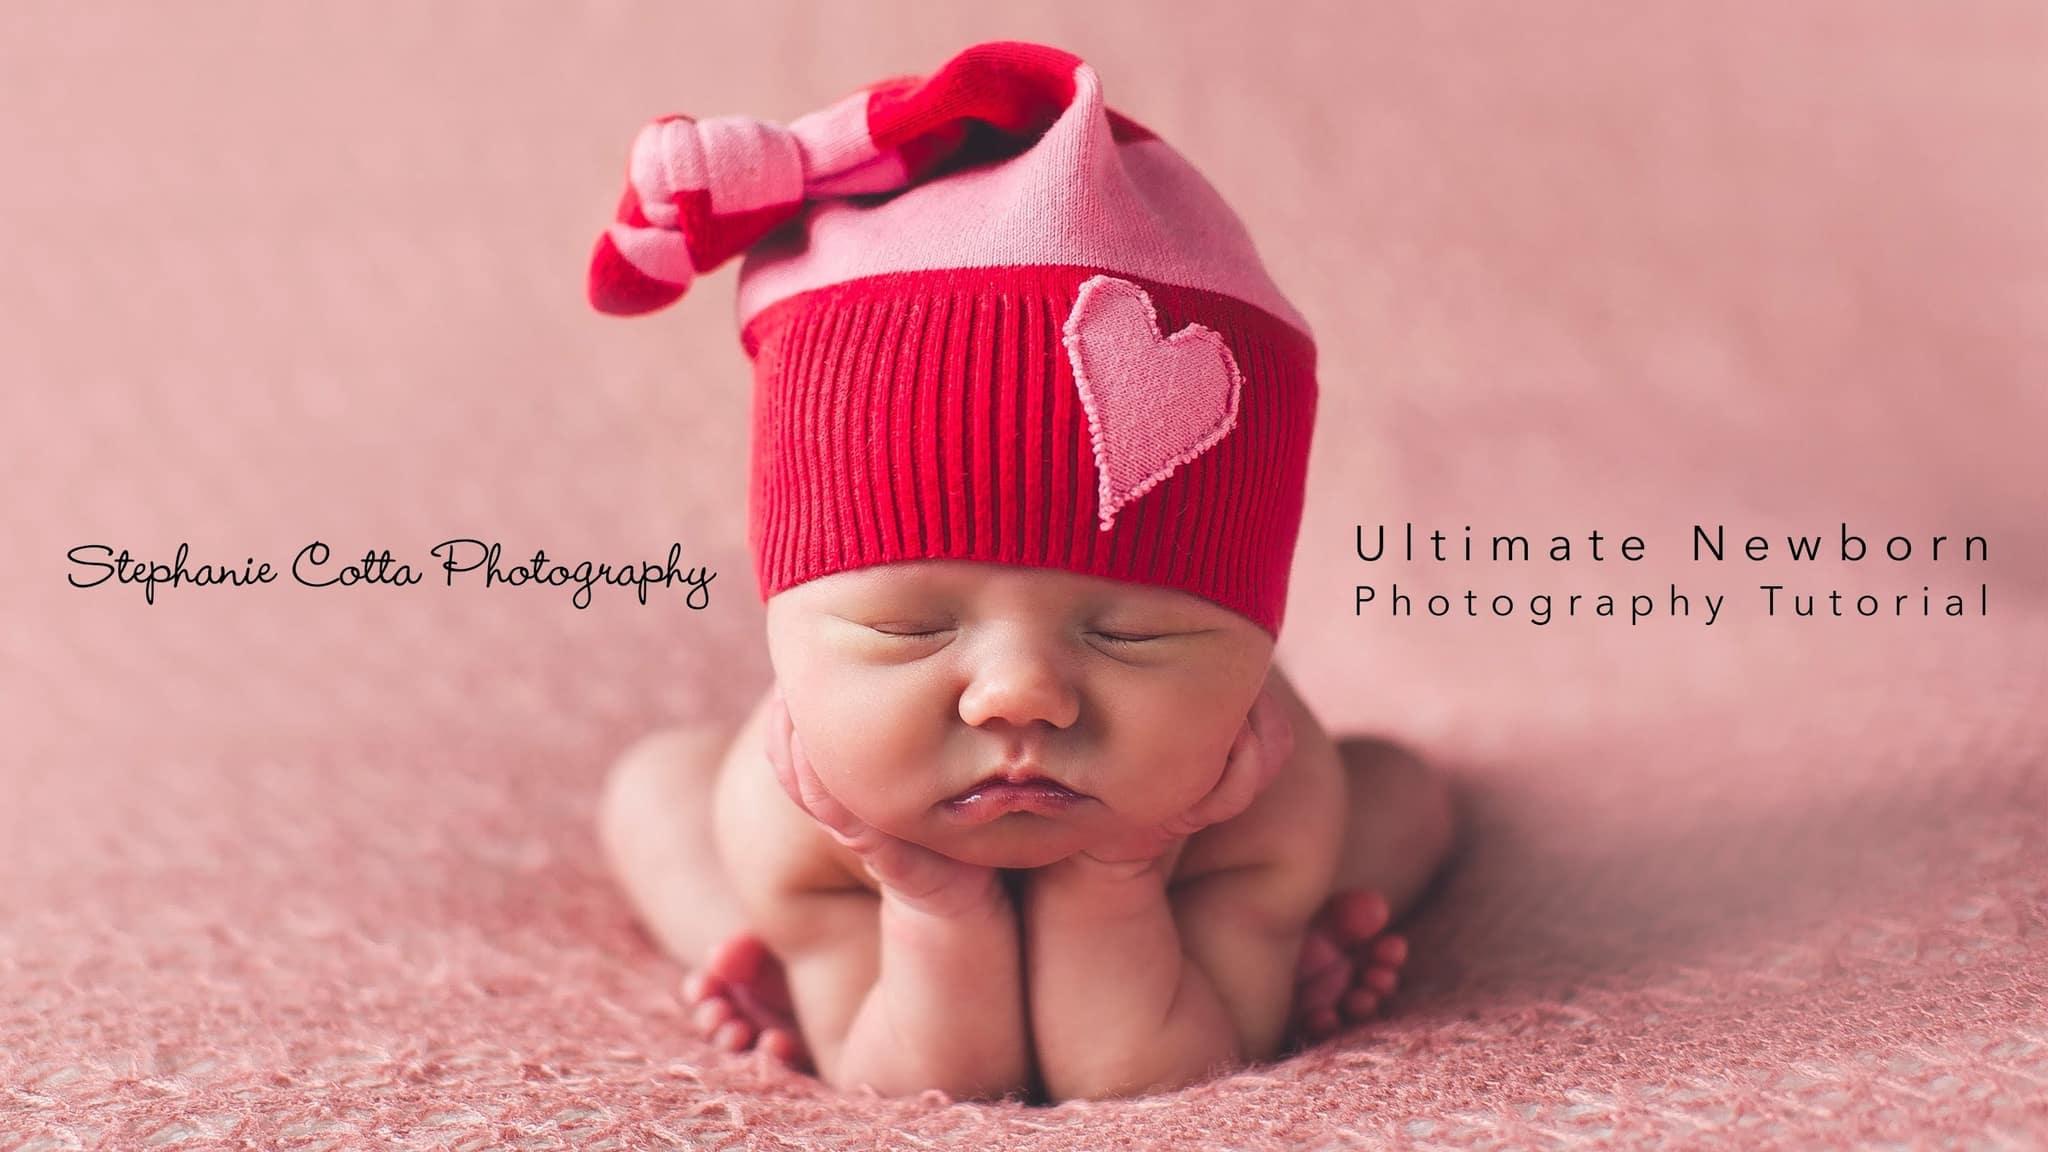 Jual rggedu the ultimate newborn photography posing tutorial bang dori tokopedia